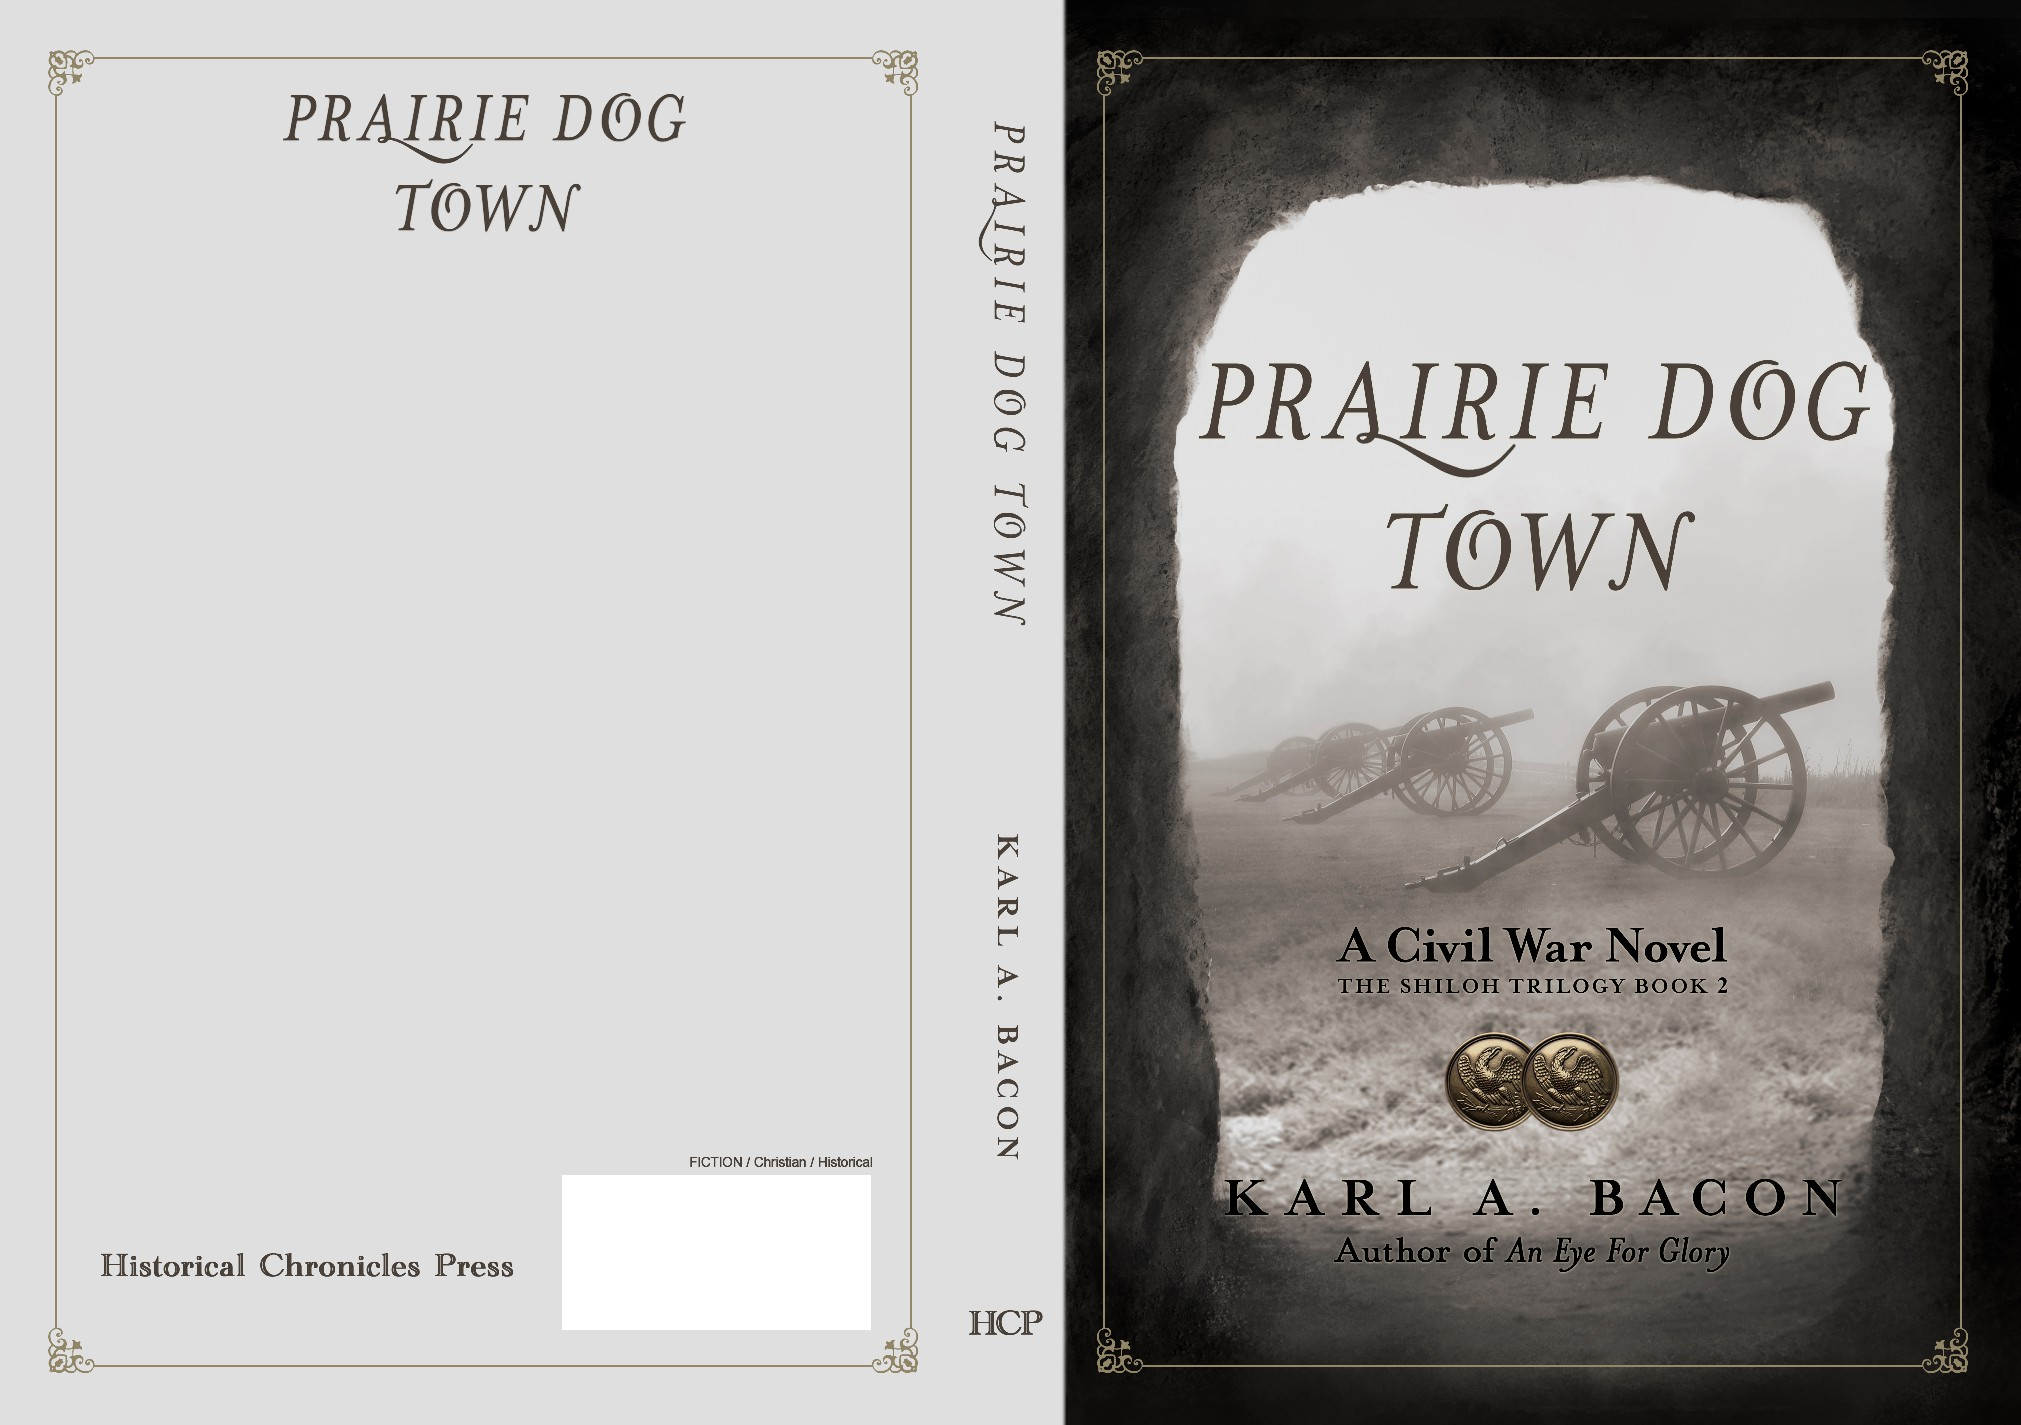 Create an intriguing American Civil War novel cover